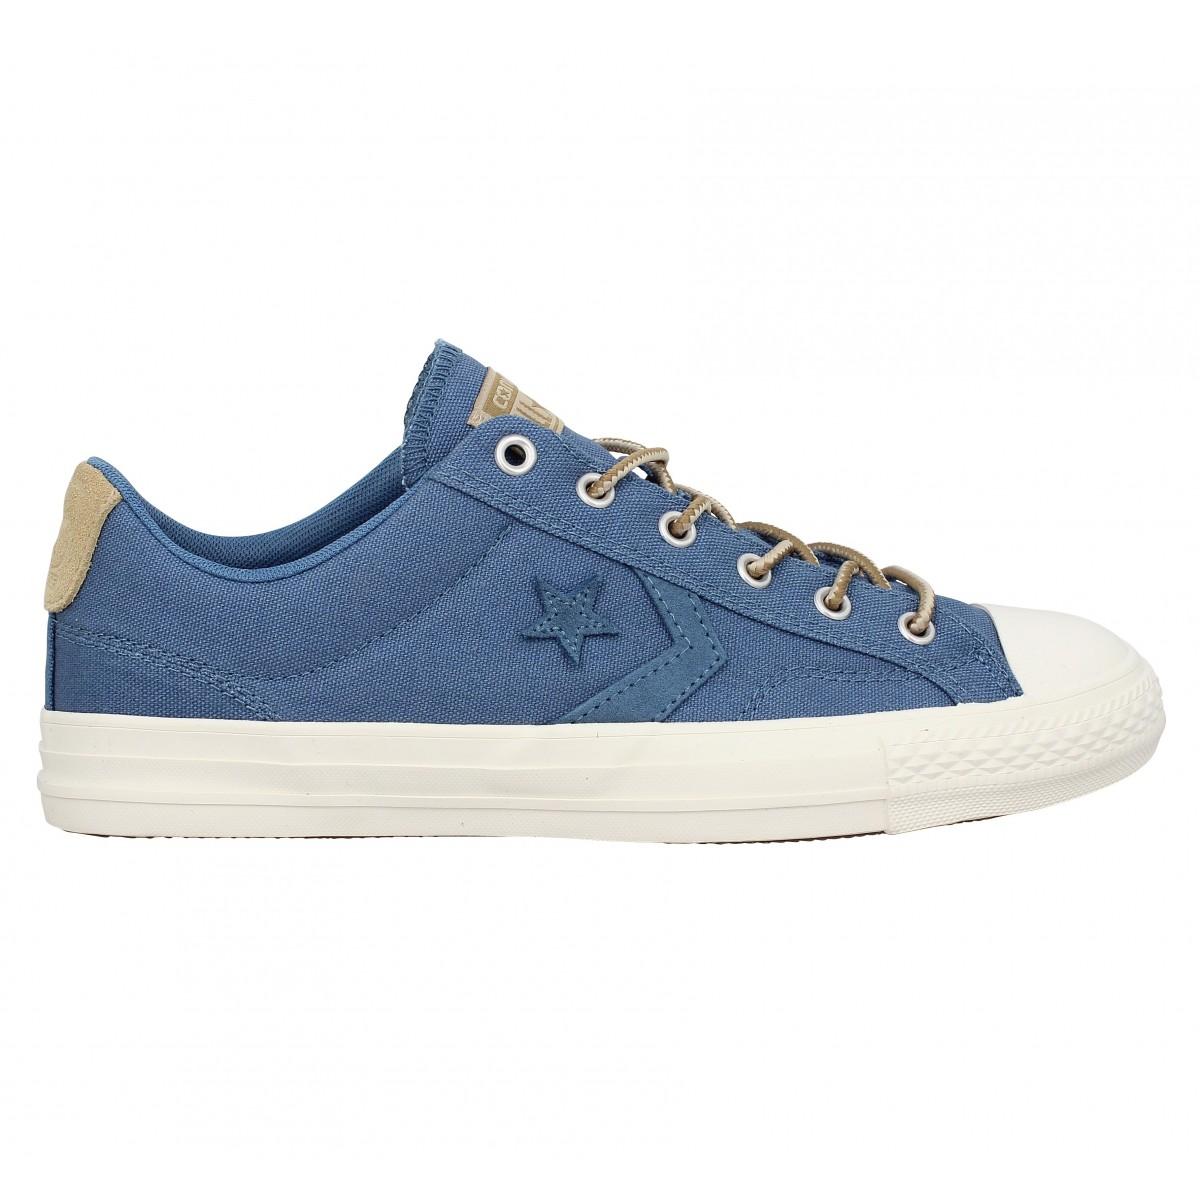 converse bleu vintage